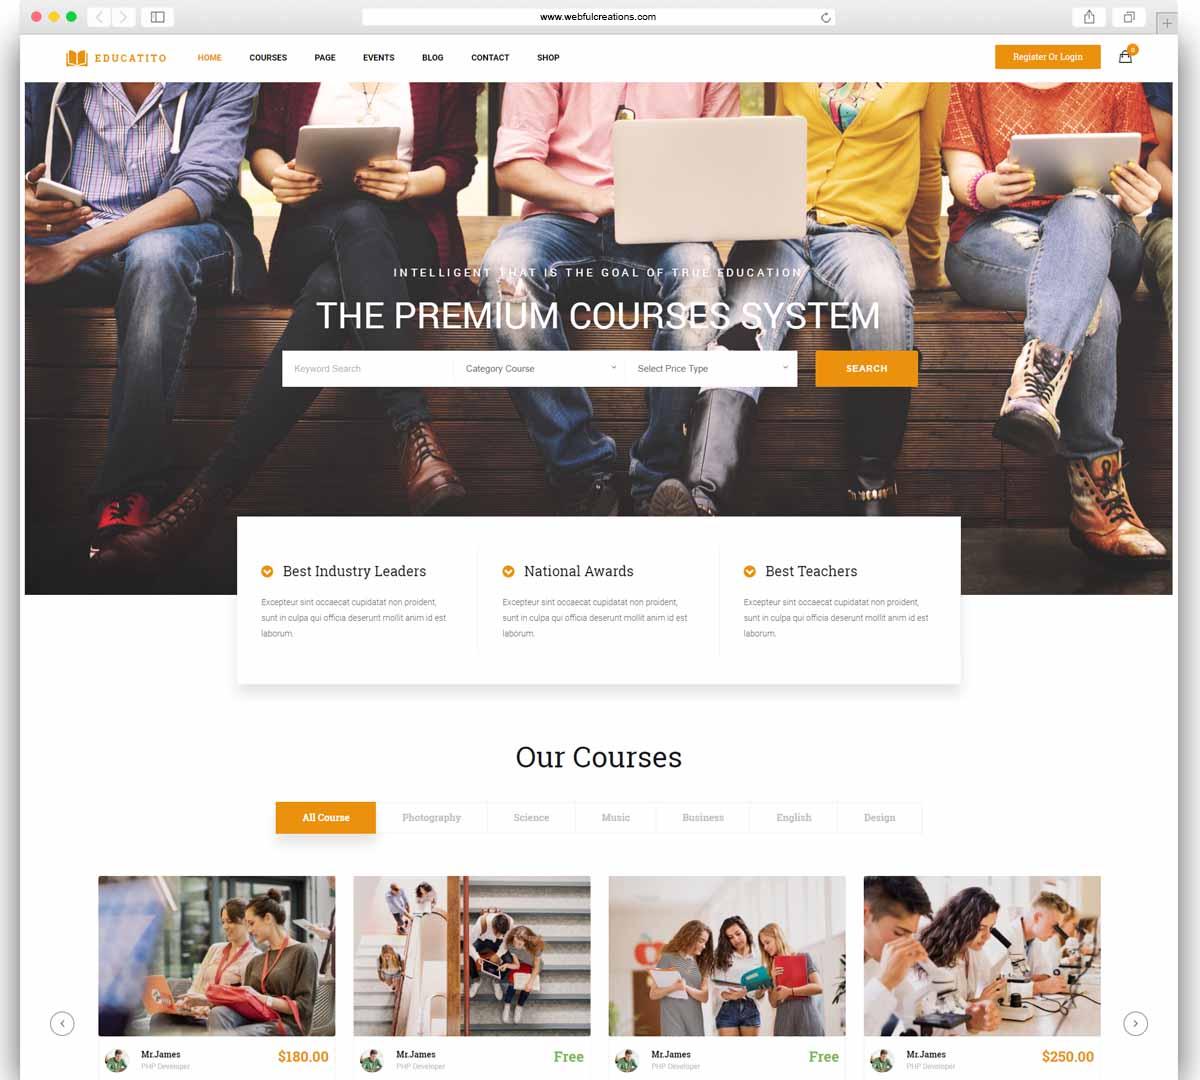 Educatito - Multiconcept Education & Courses WordPress Theme